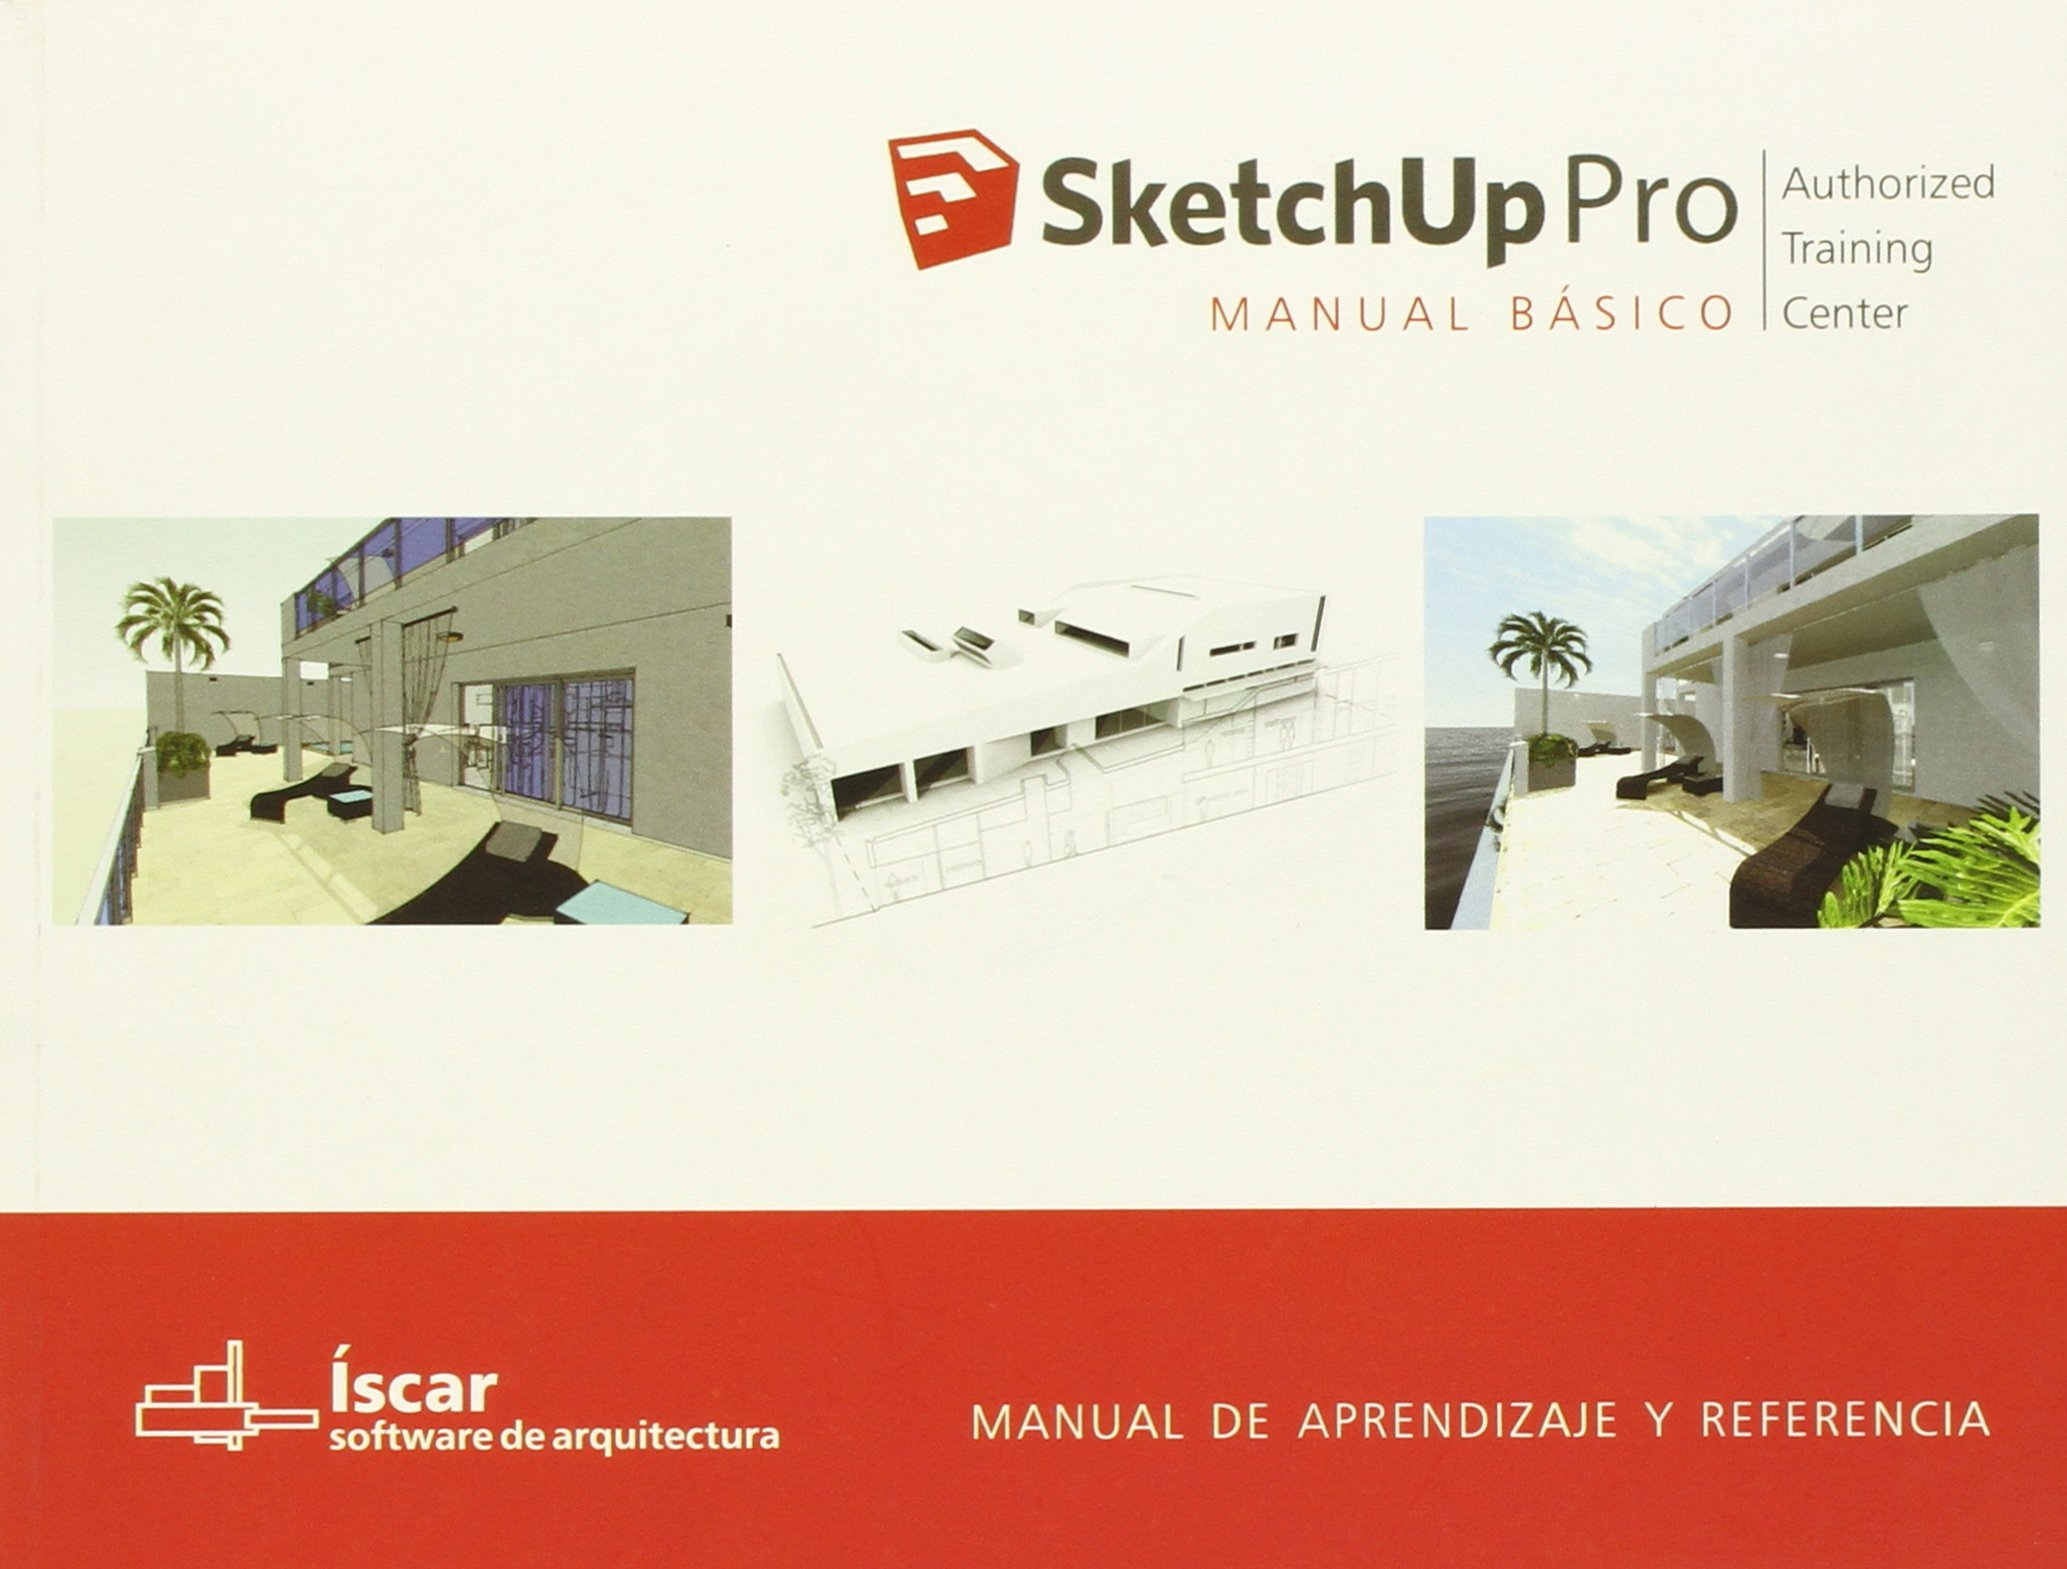 sketchup pro manual basico julio calle cabrero 9788461720194 rh amazon com google sketchup manual pdf google sketchup manual pdf download